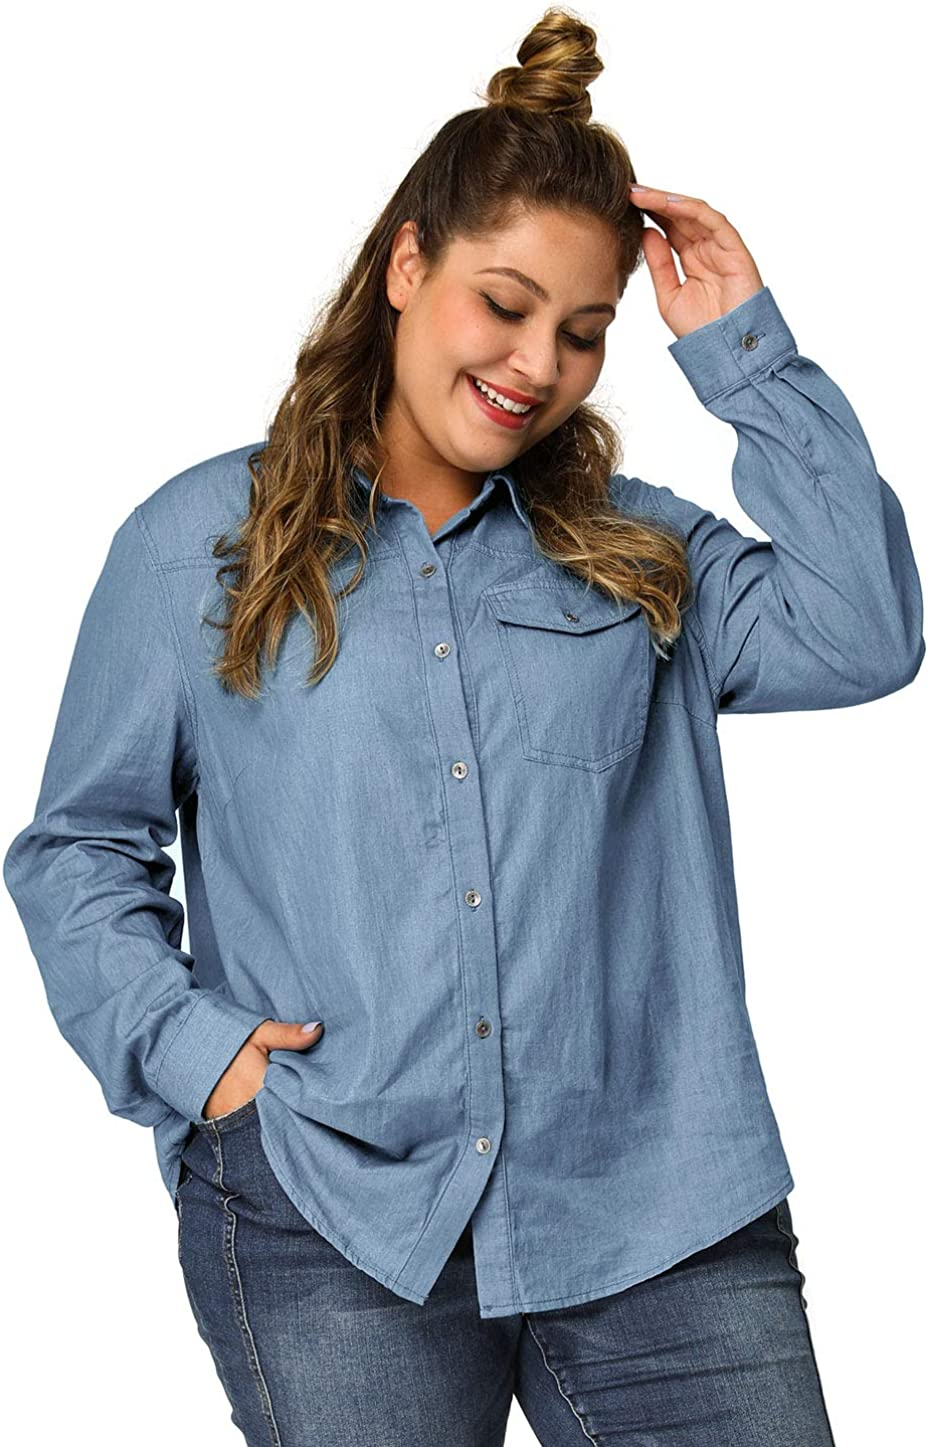 Agnes Orinda Women's Plus Size Denim Shirts Long Sleeve Chest Pocket Button Down Chambray Shirt